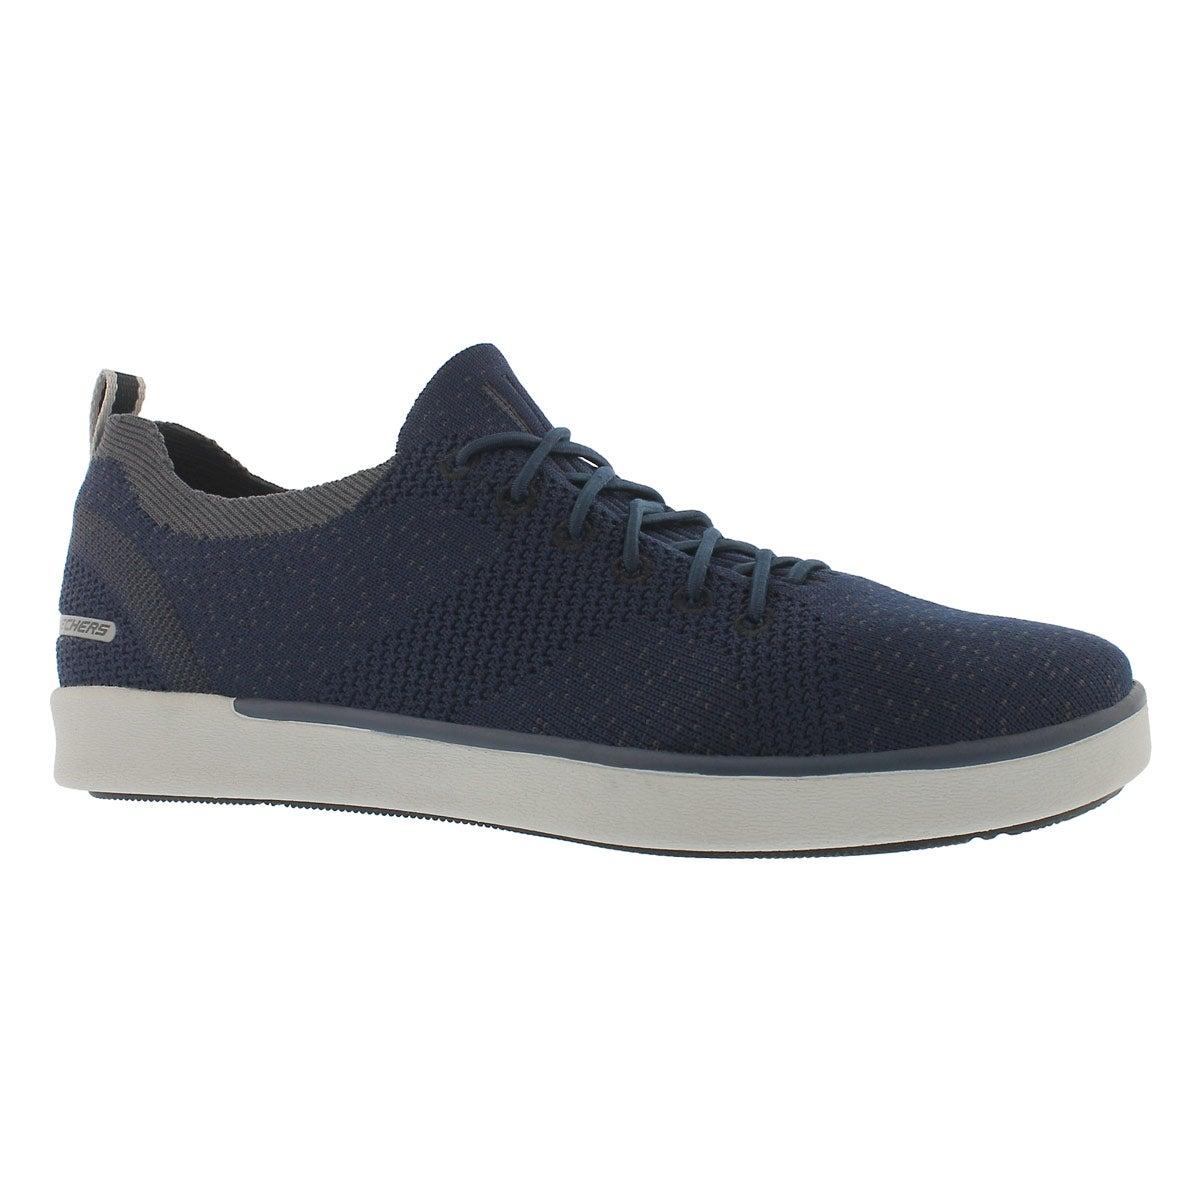 Men's BOYAR MOLSEN navy slip on sneakers